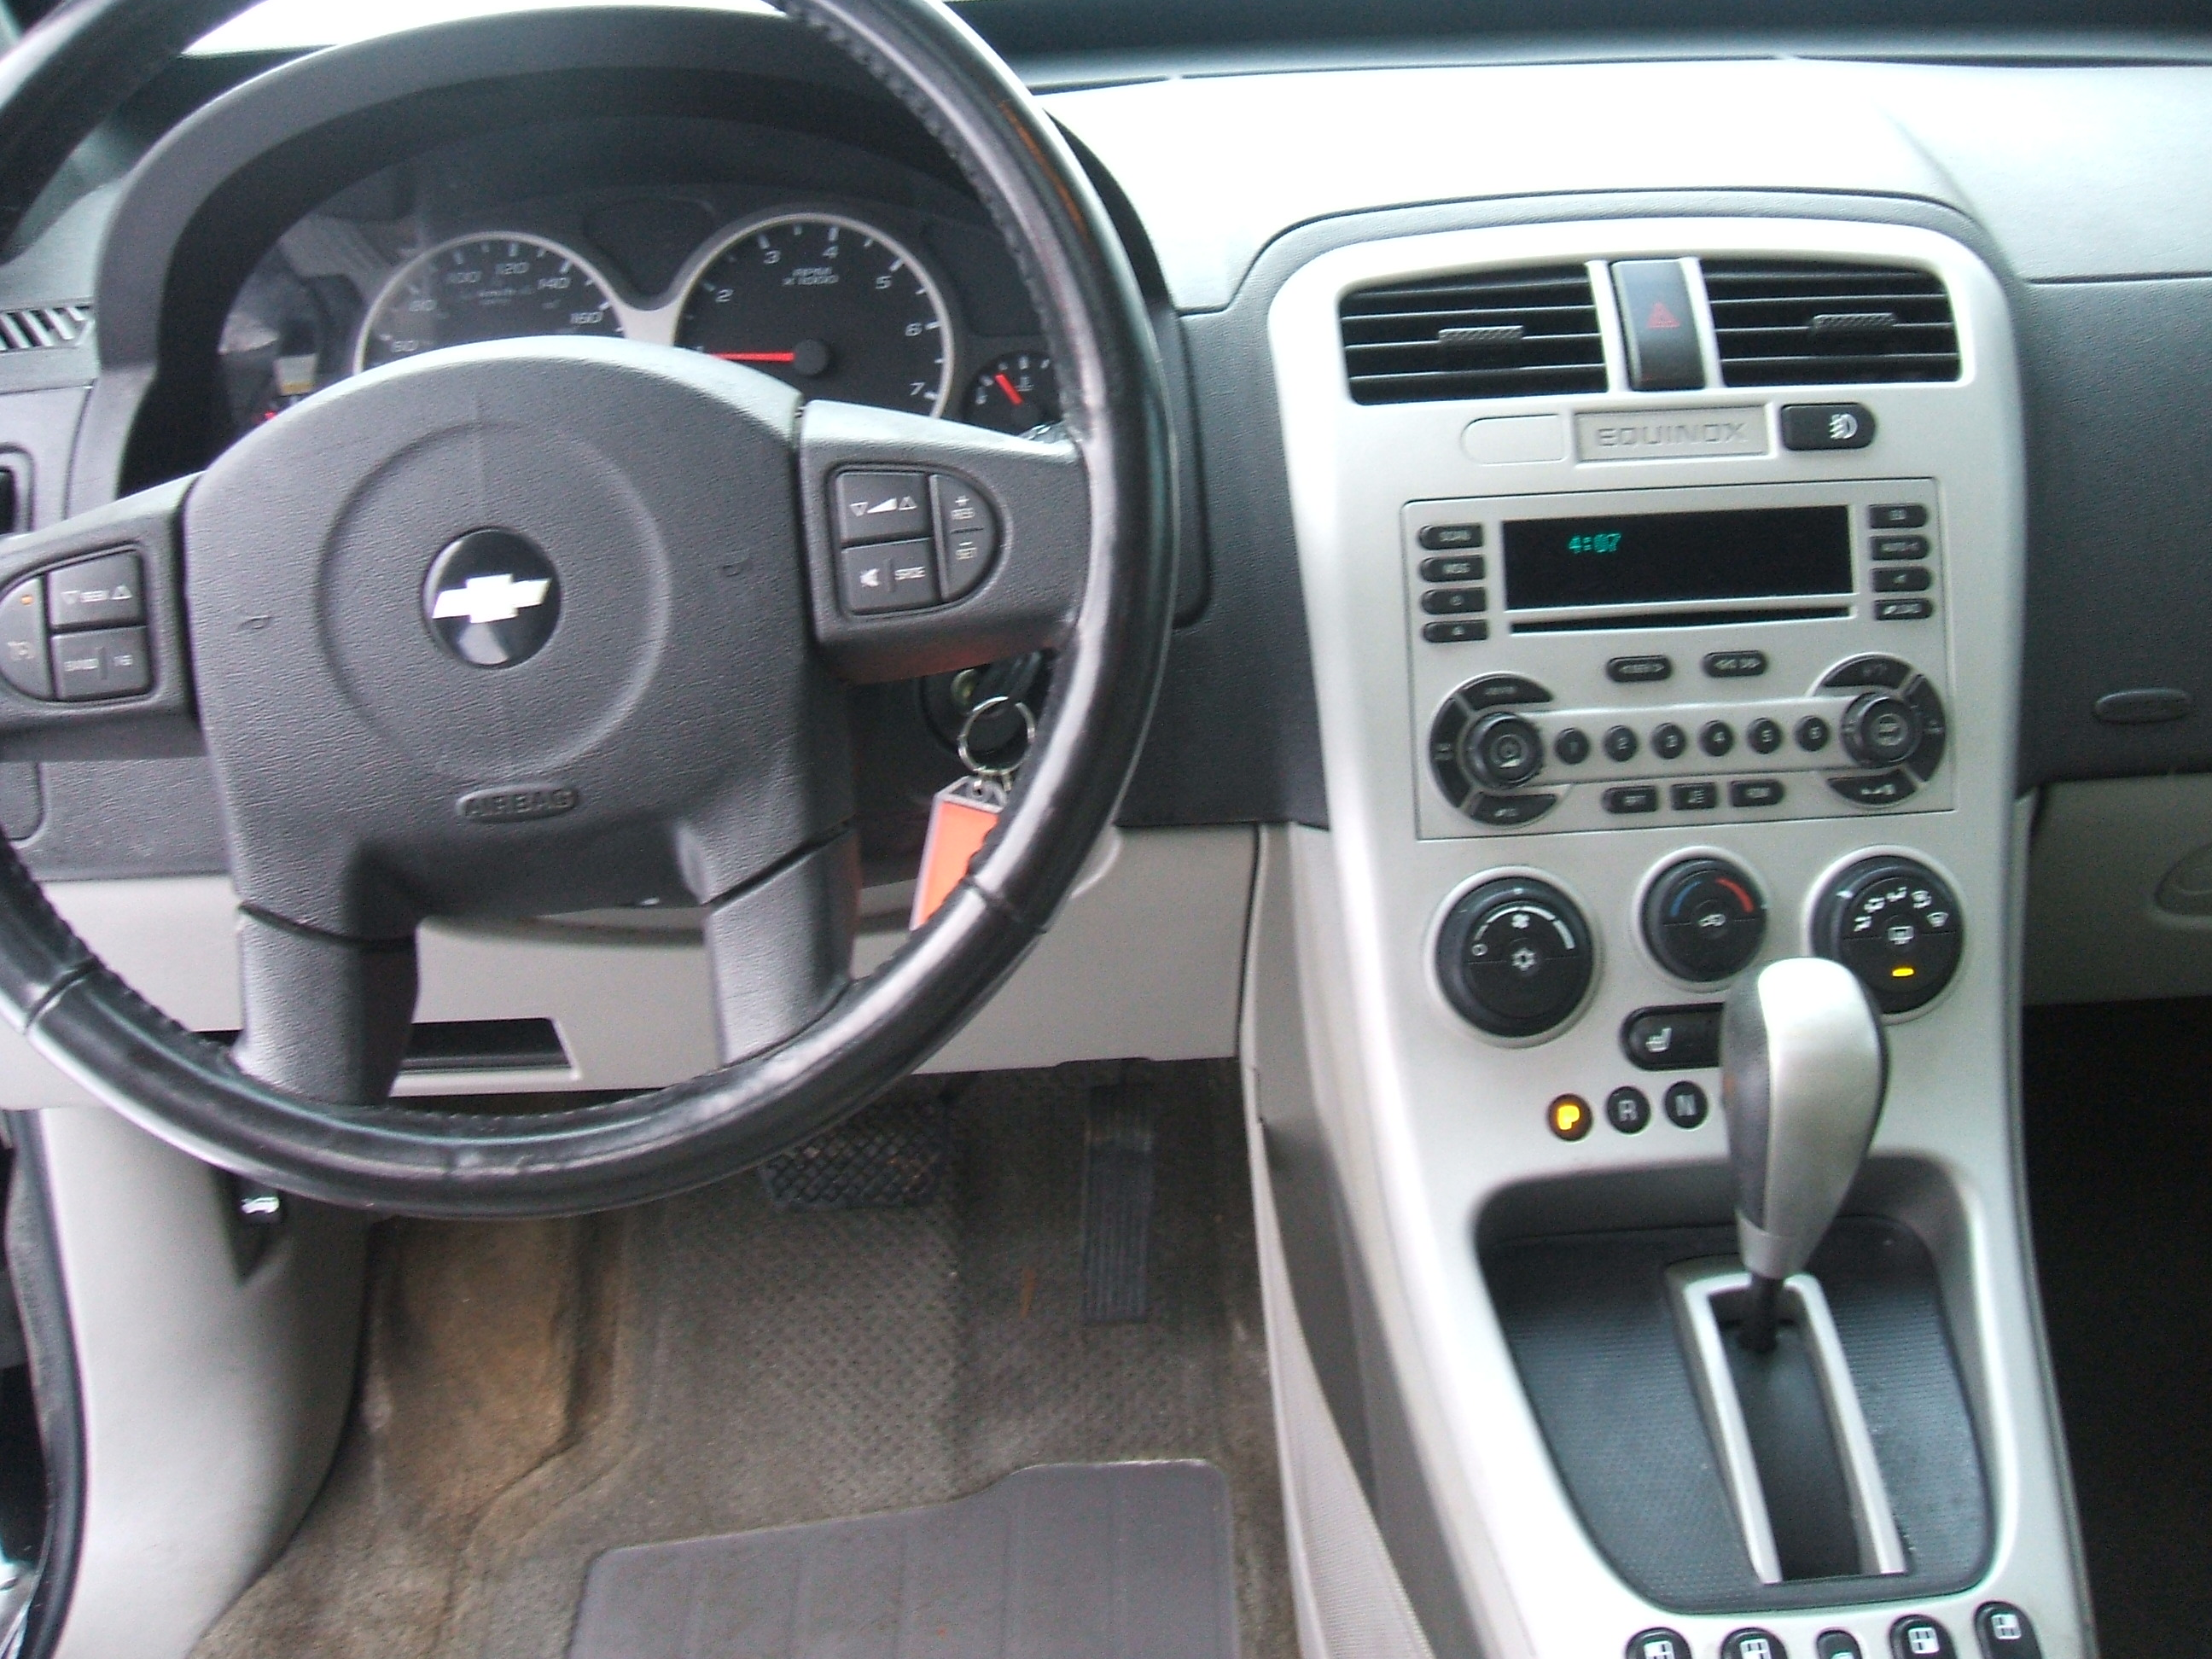 2006 CHEVROLET EQUINOX LT AWD (10)